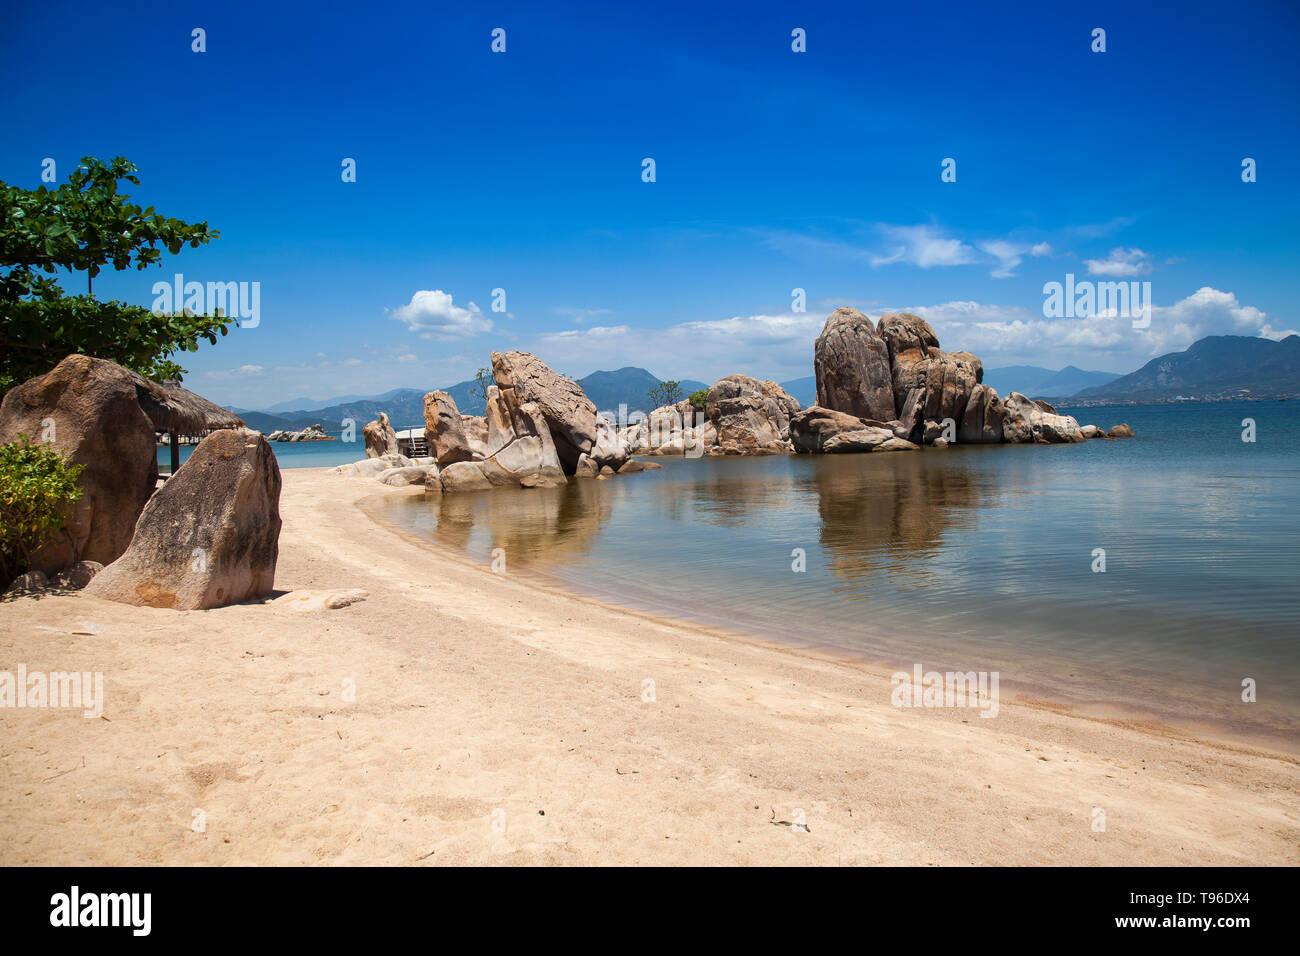 The beach from the Small bungalow resort Ngoc Suong, in Cam Ranh Bay,south china sea, Nha Trang, Vietnam, Asia Stock Photo